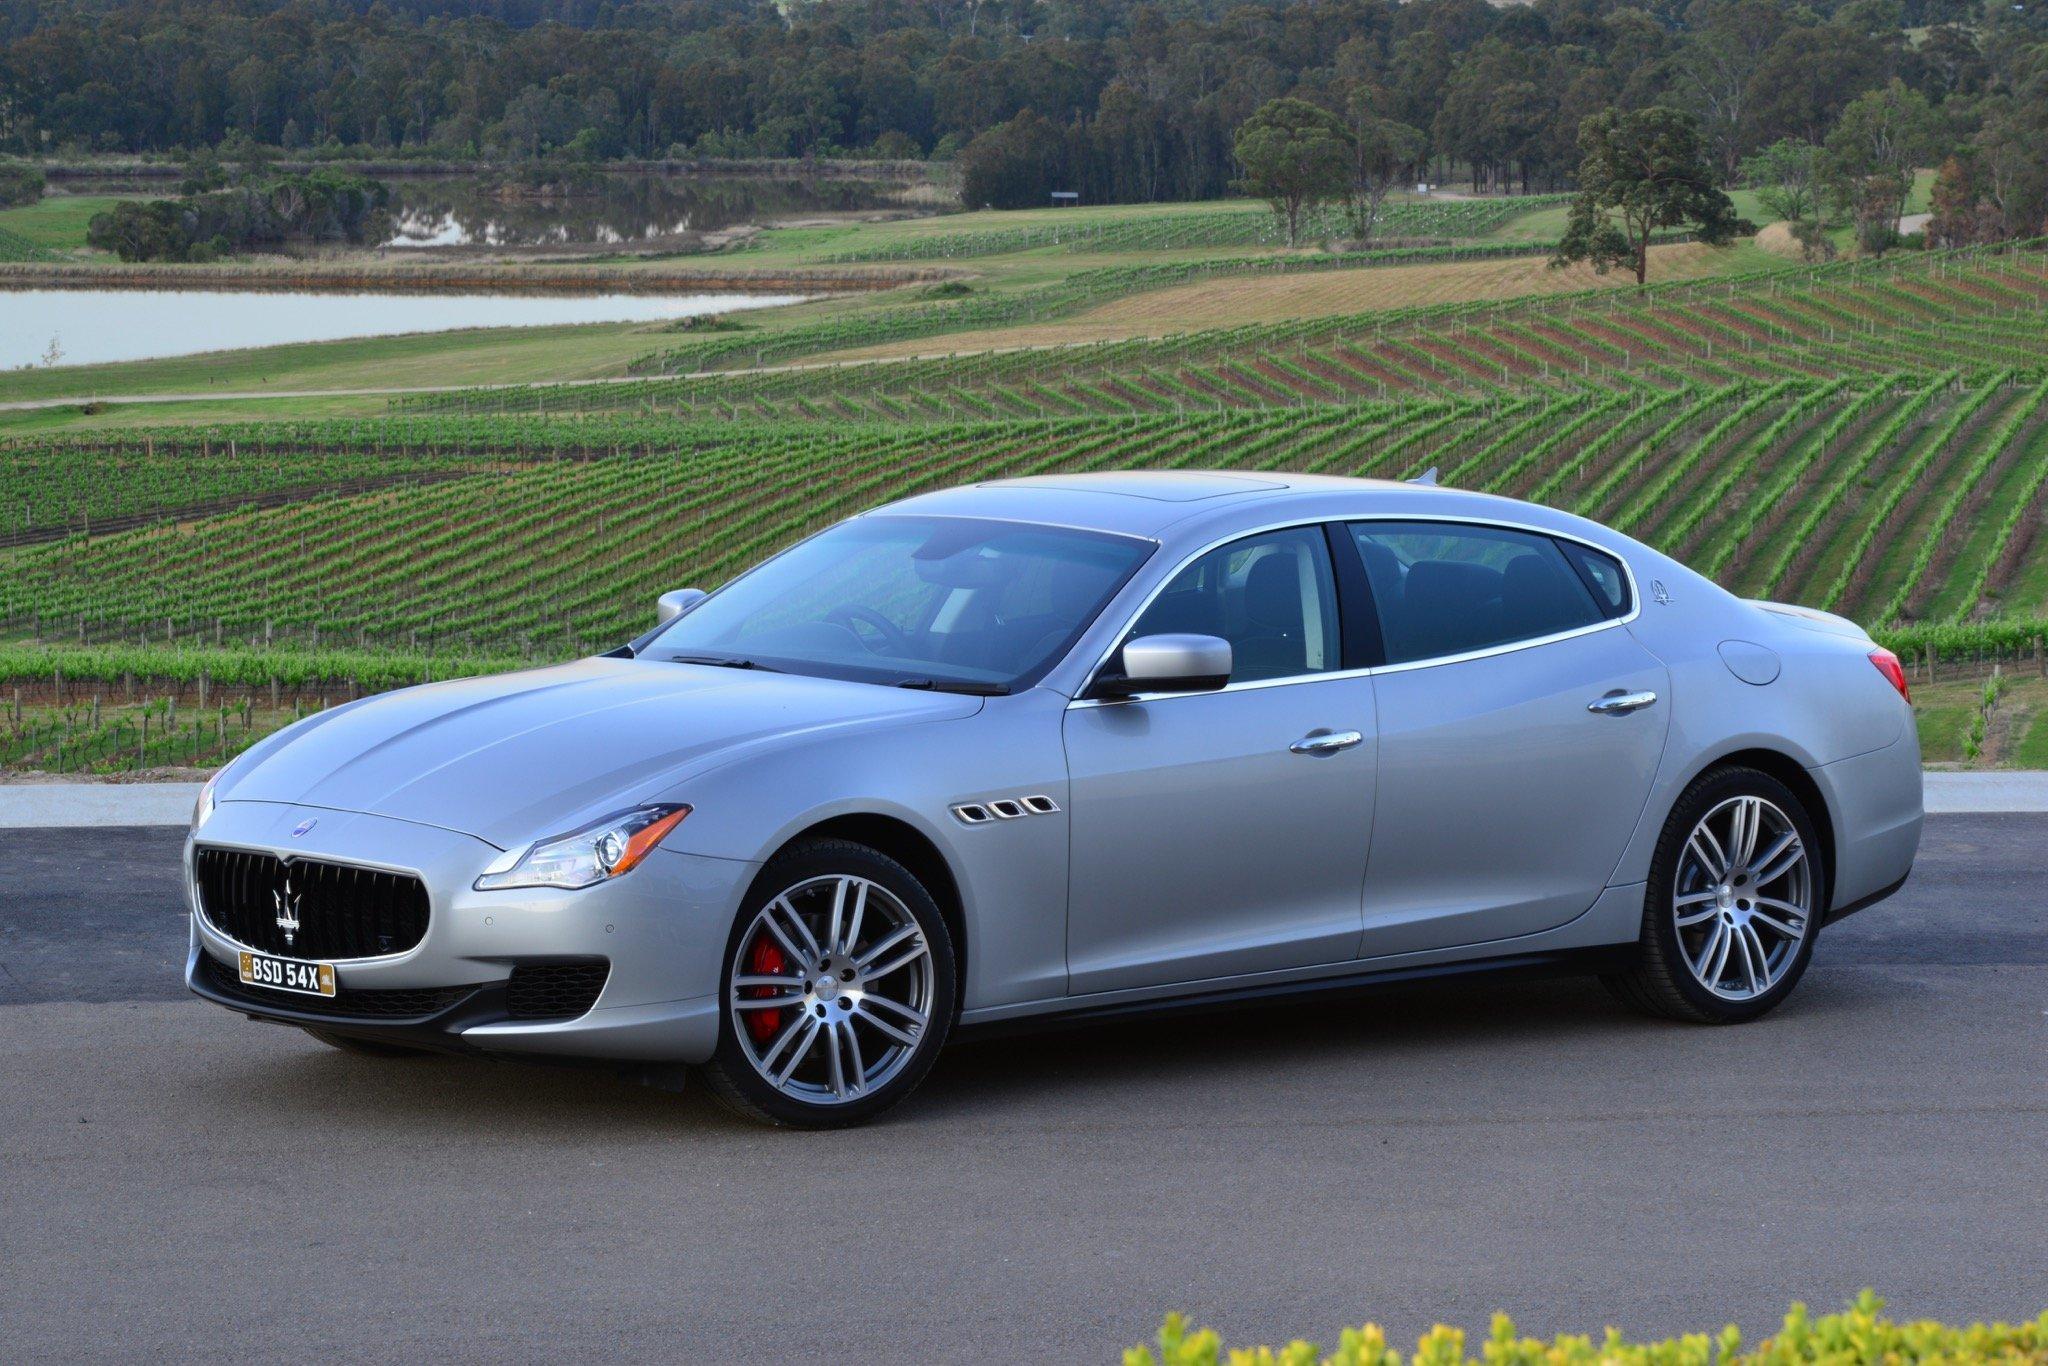 2016 Maserati Quattroporte Review Caradvice